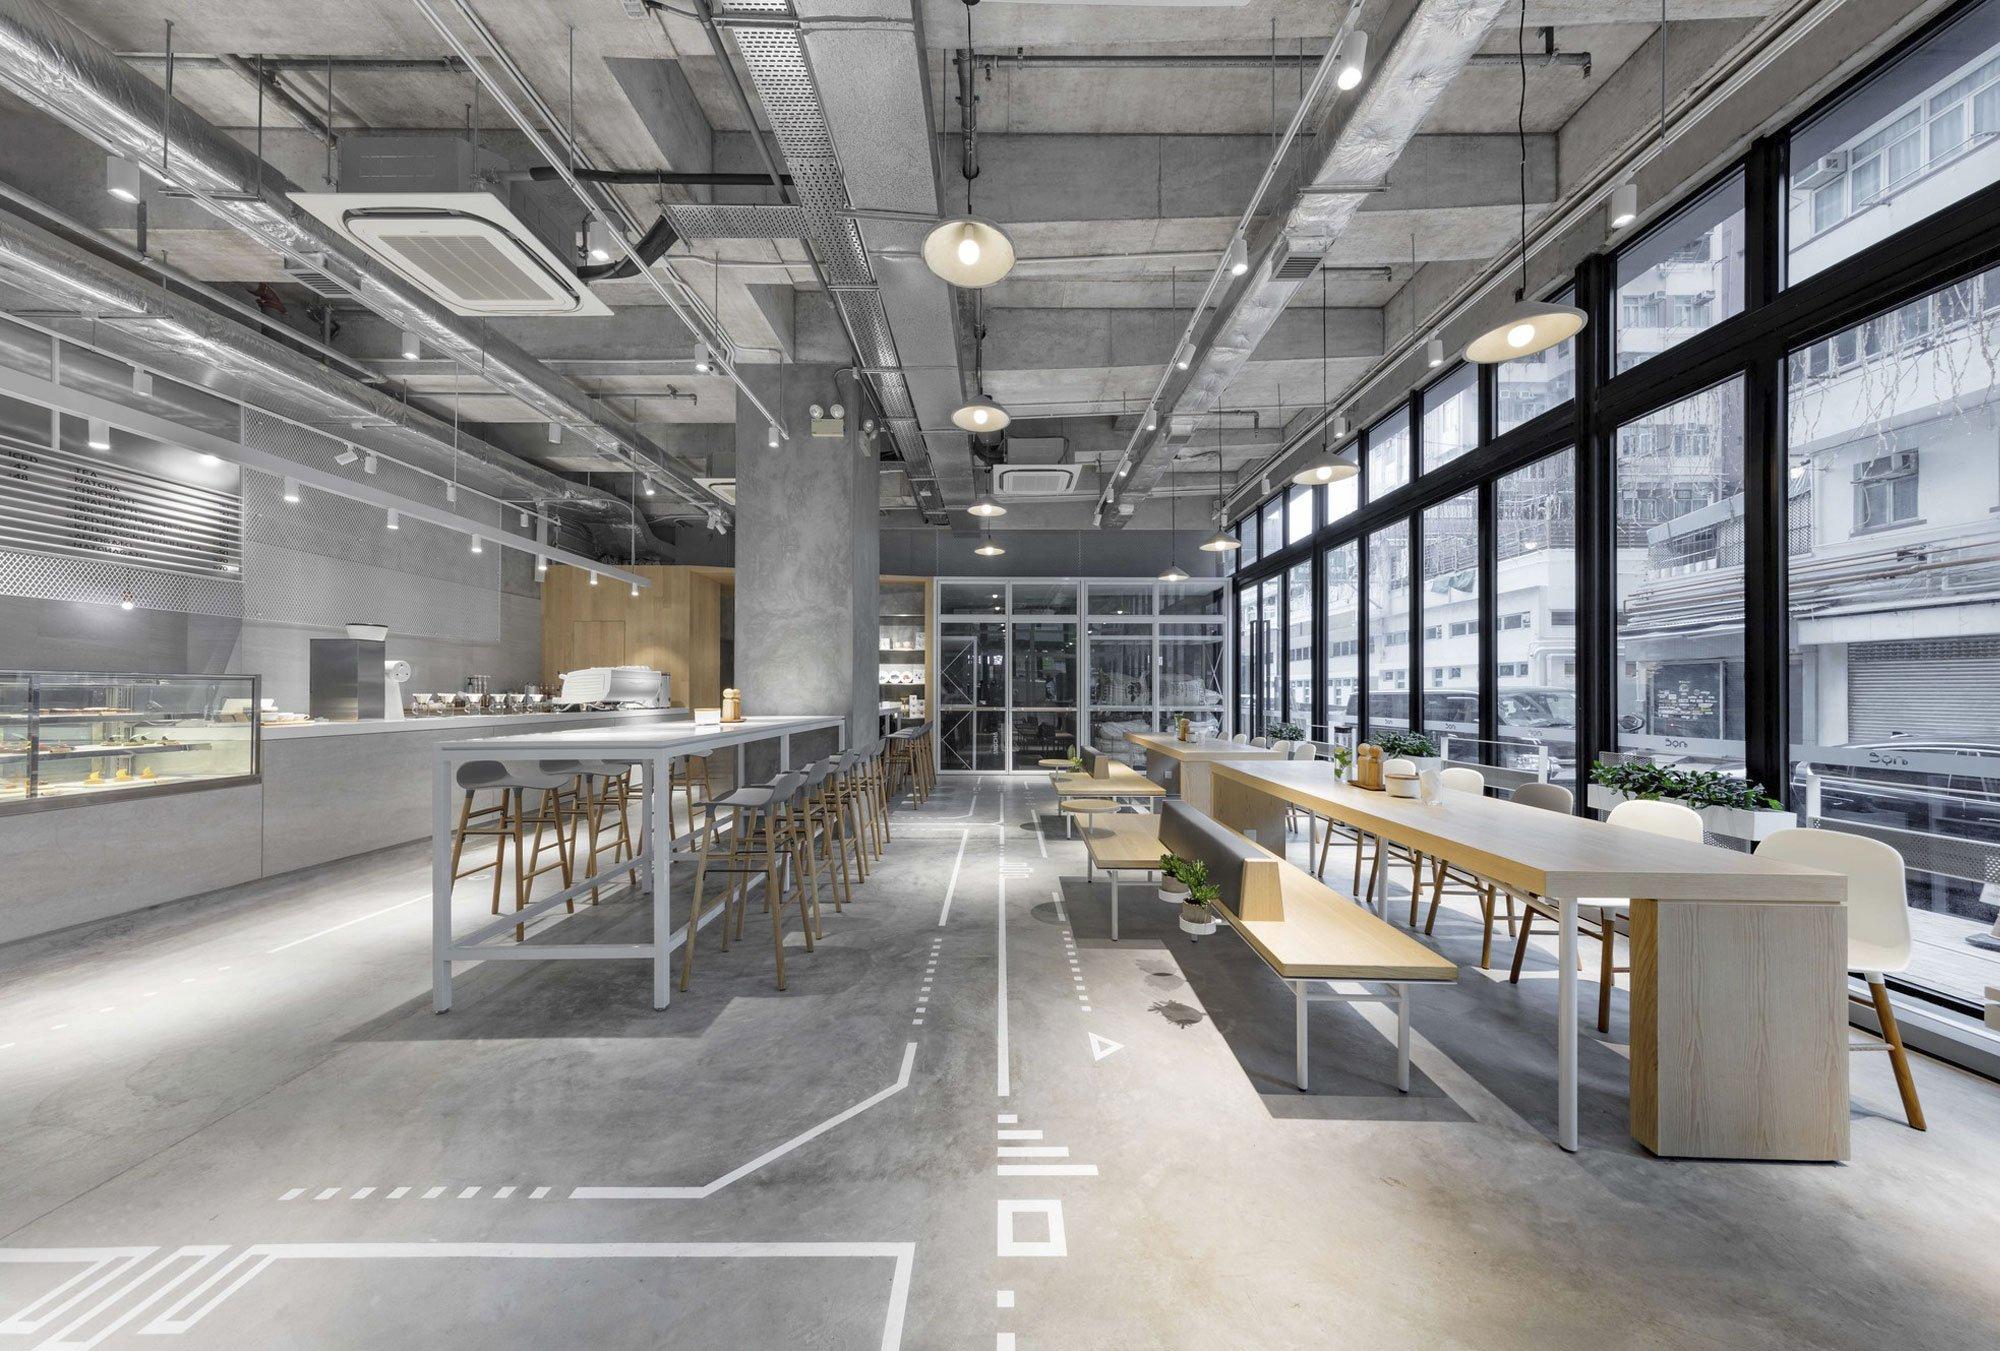 NOC Coffee Co. by Studio Adjective, coffee shop design